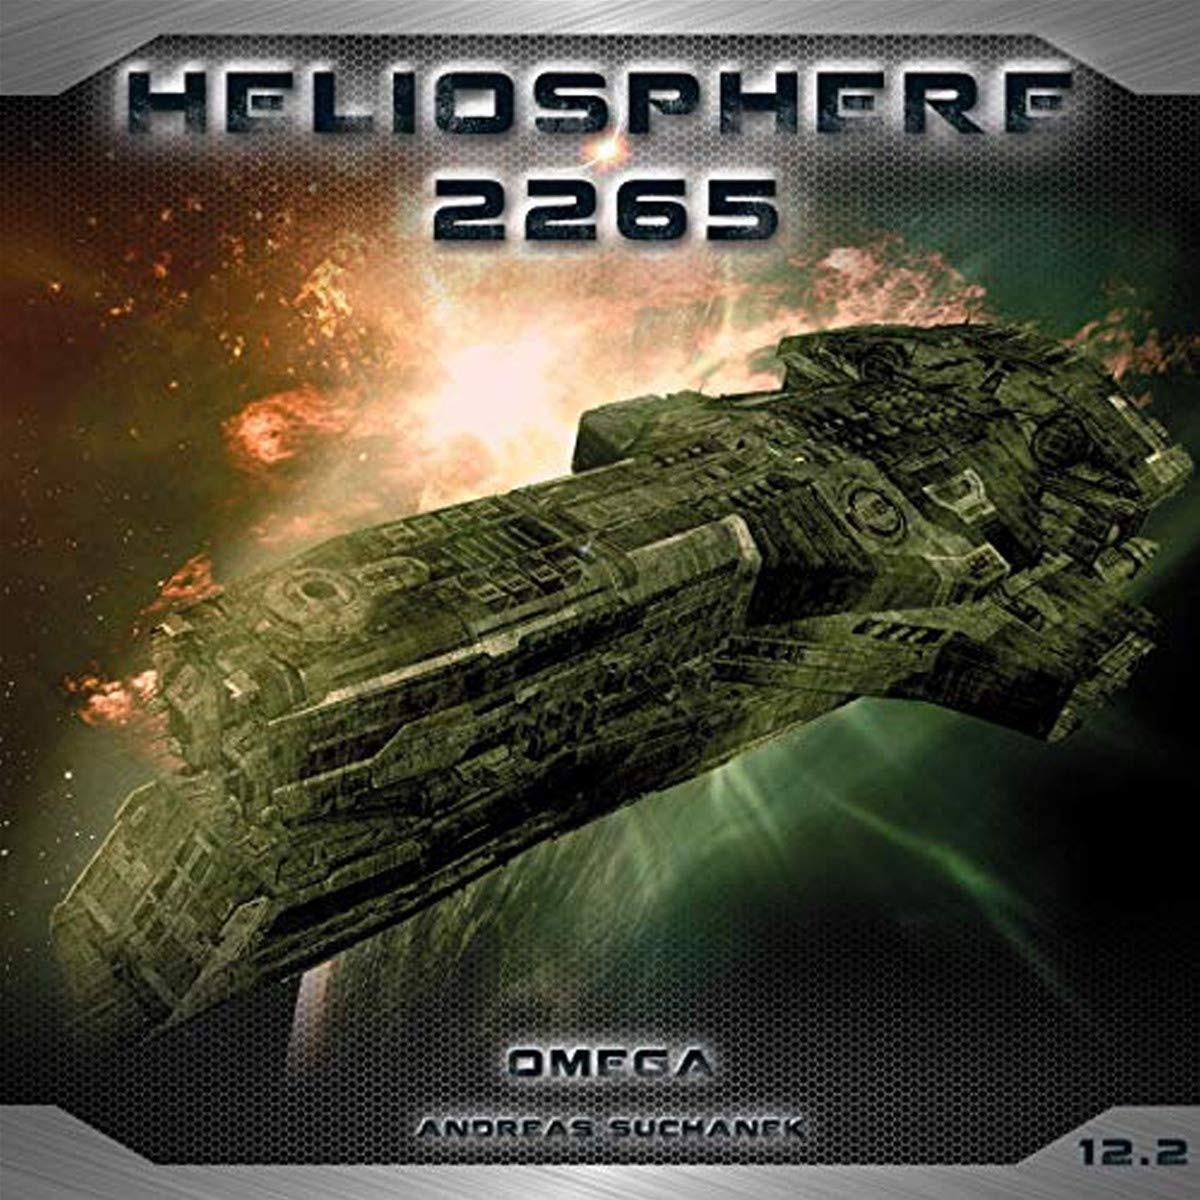 Heliosphere 2265 - Folge 12.2: Omega